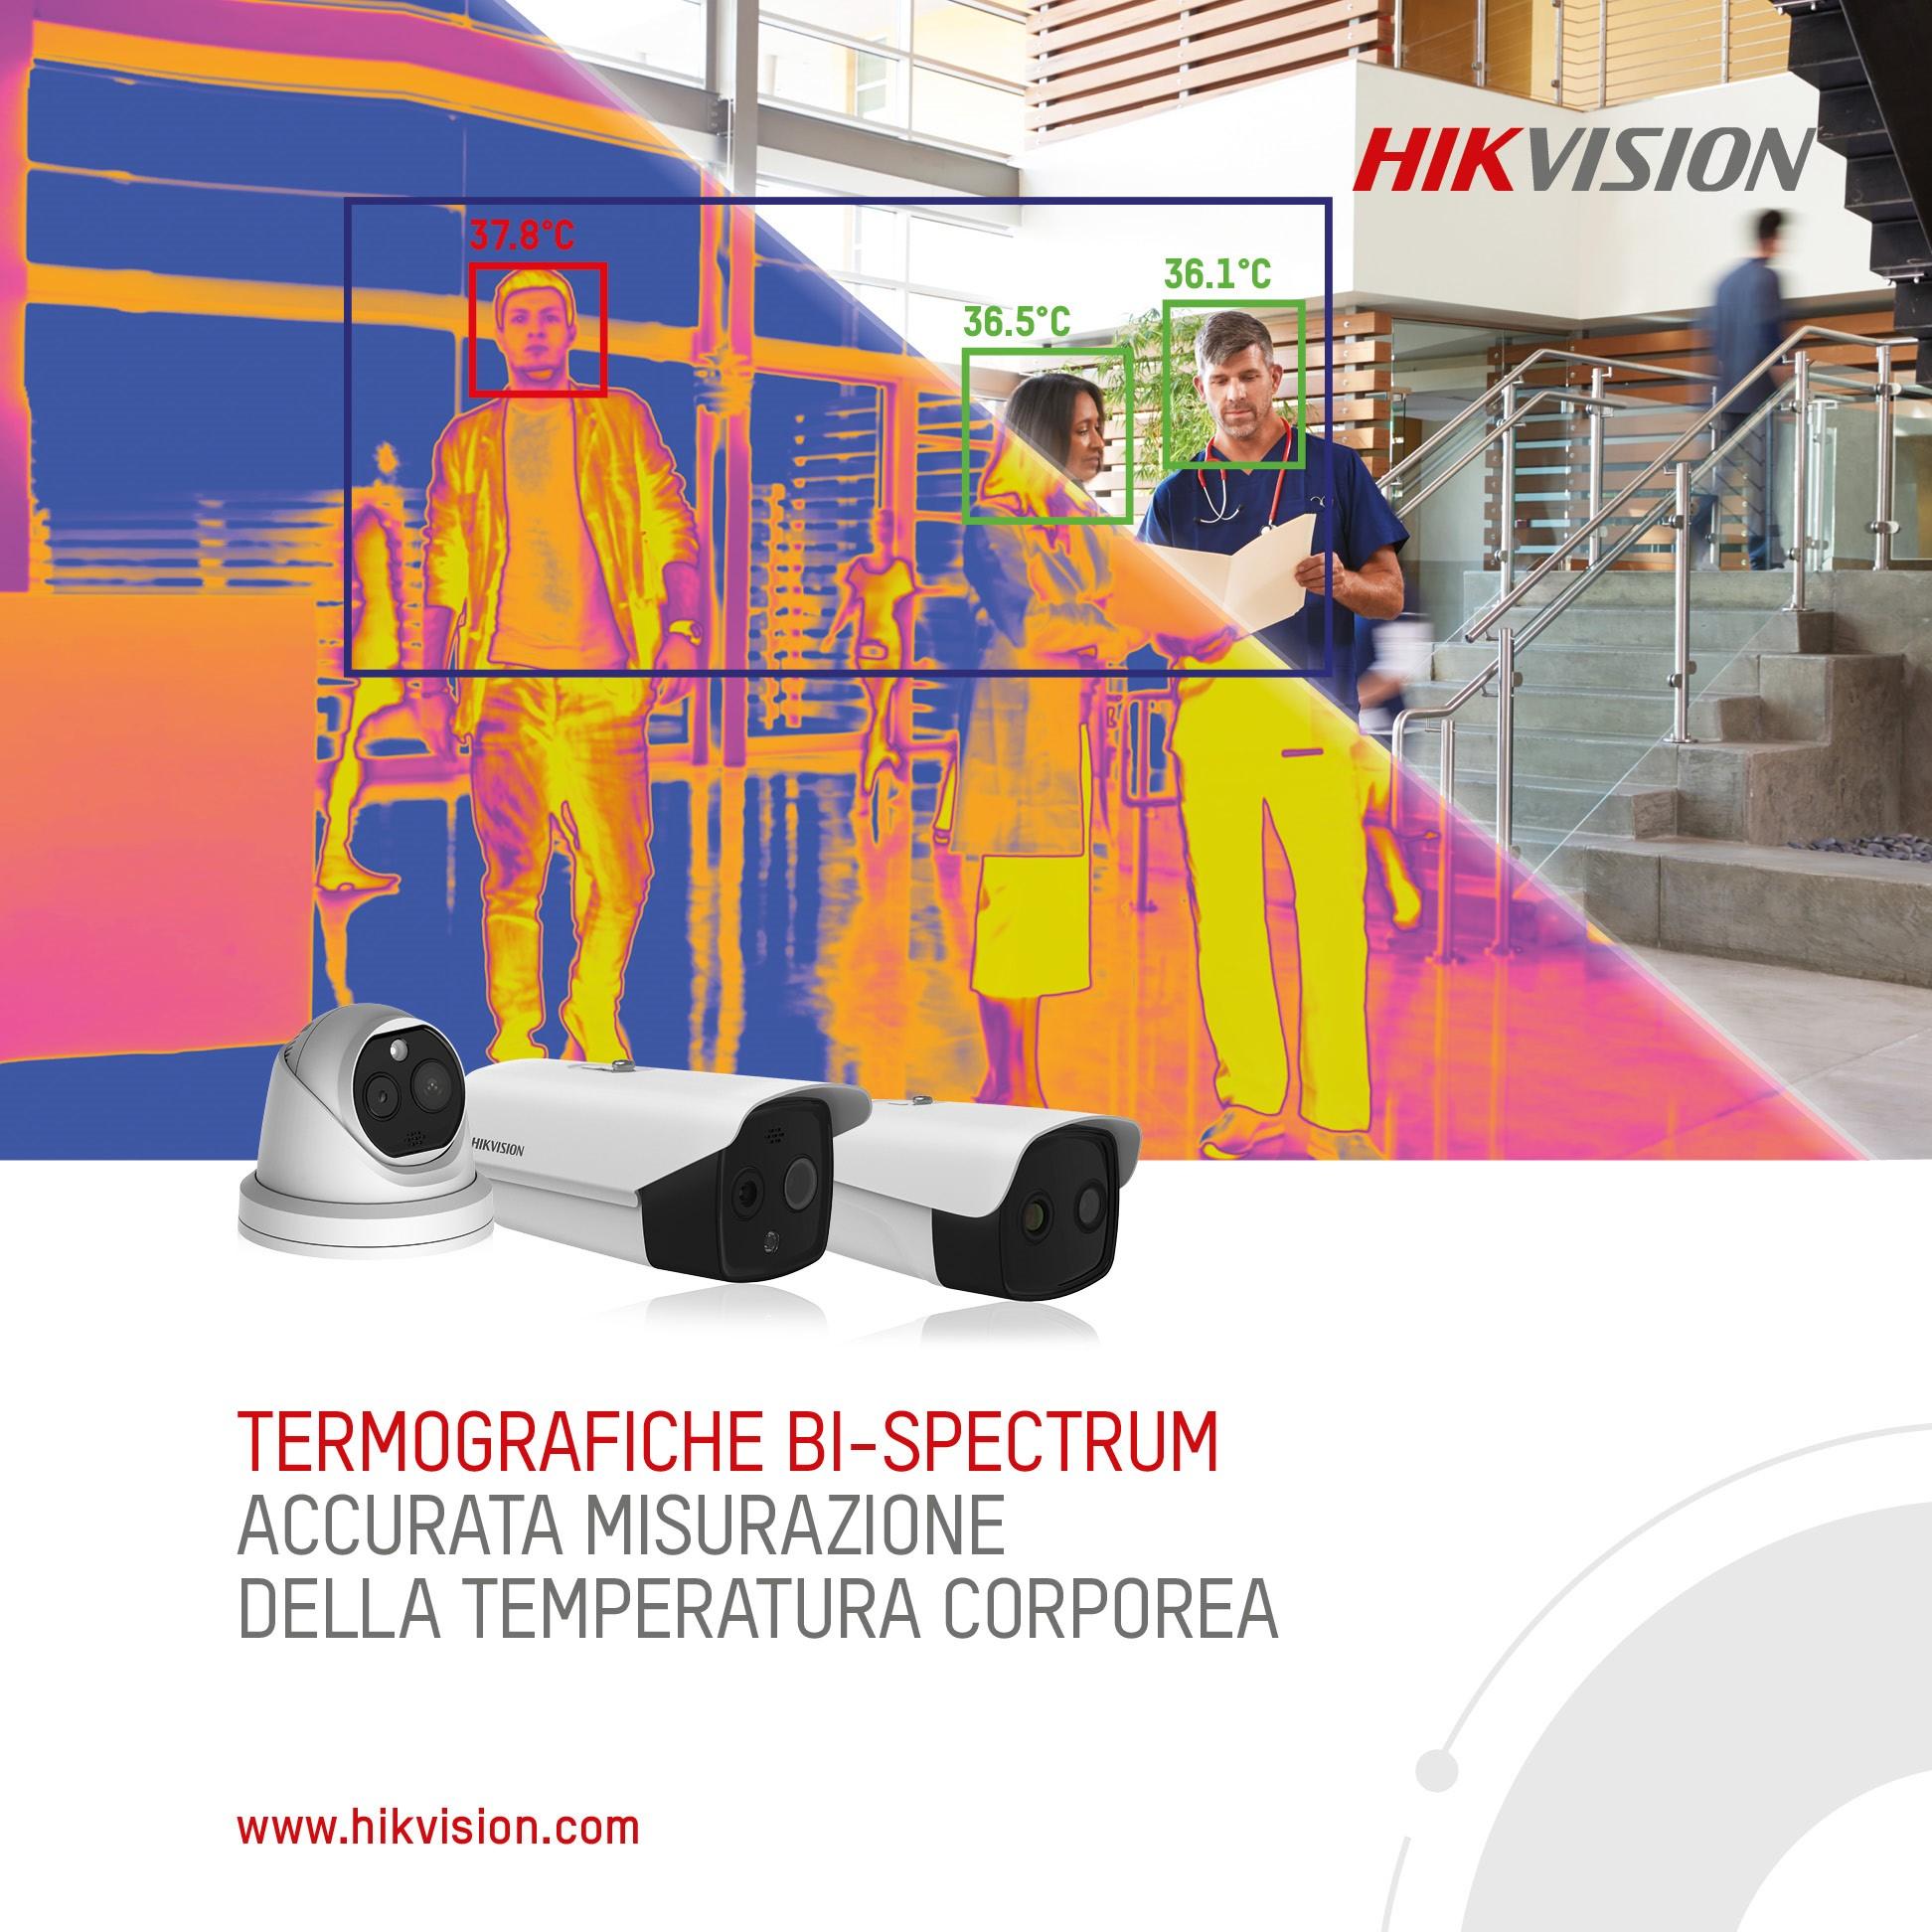 hikvision-termiche